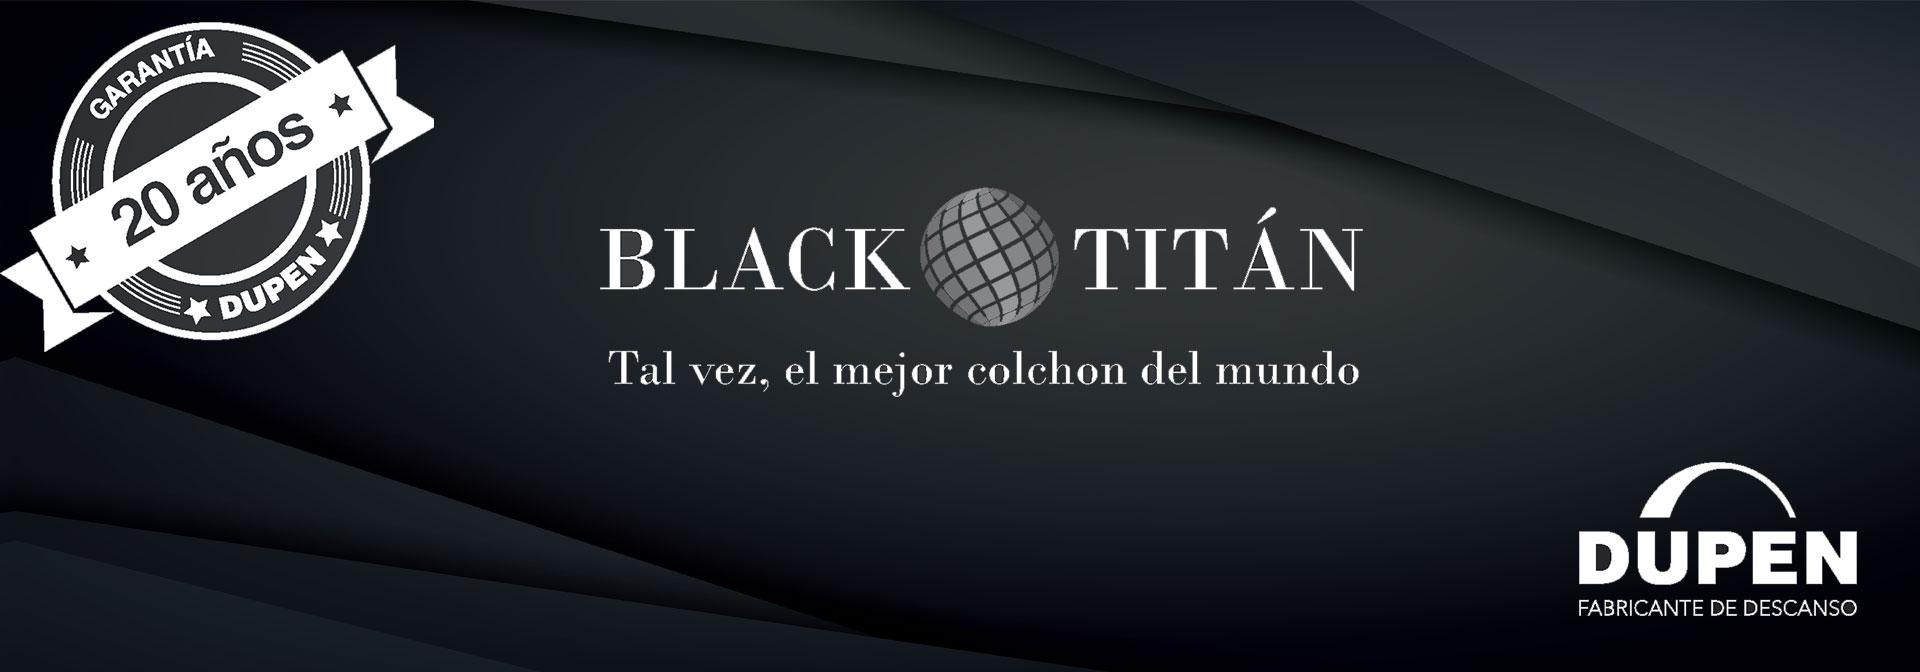 Banner black titan mega